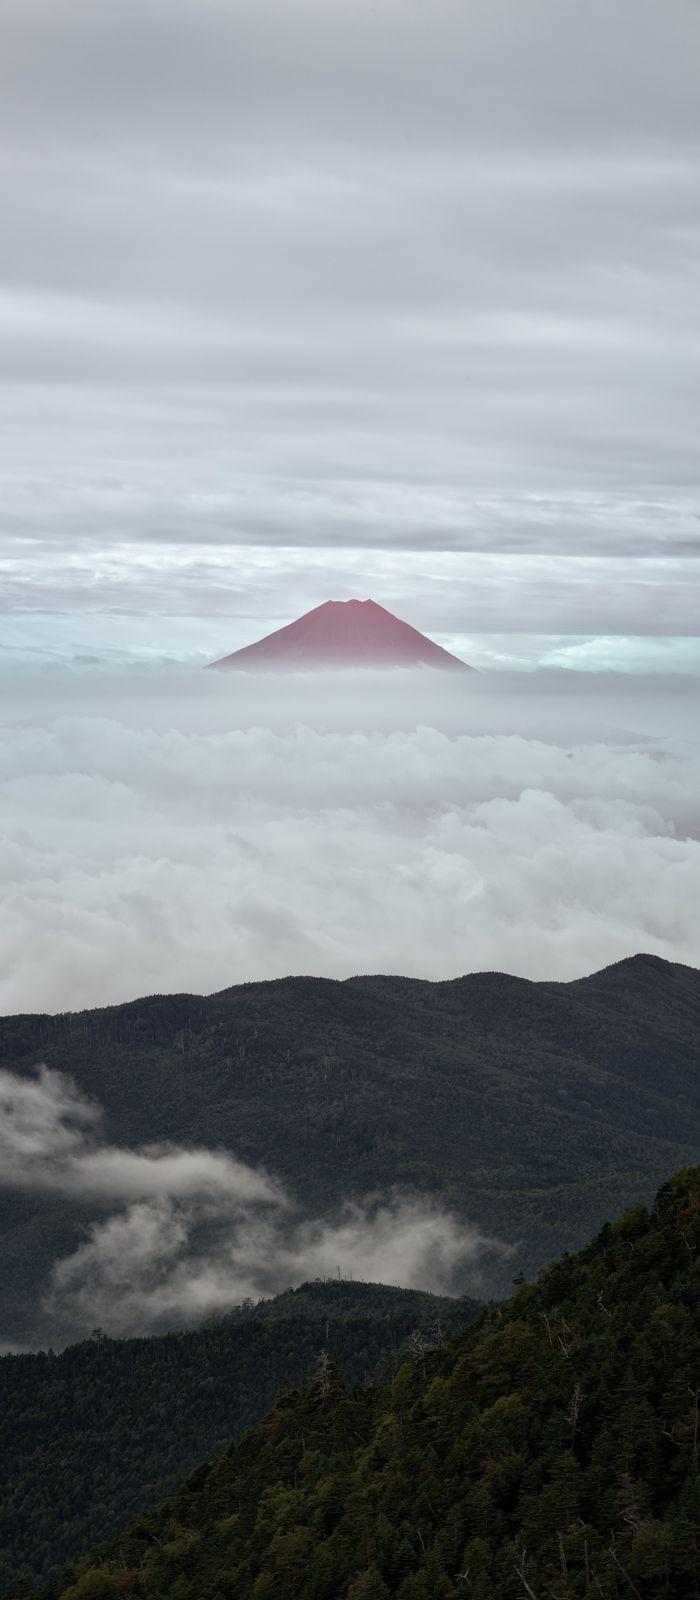 Portofolio Fotografi Pemandangan - Mt. Fuji from Mt. Kokushigatake, Japan | Yuga Kurita...  #PHOTOGRAPHICSCENERY